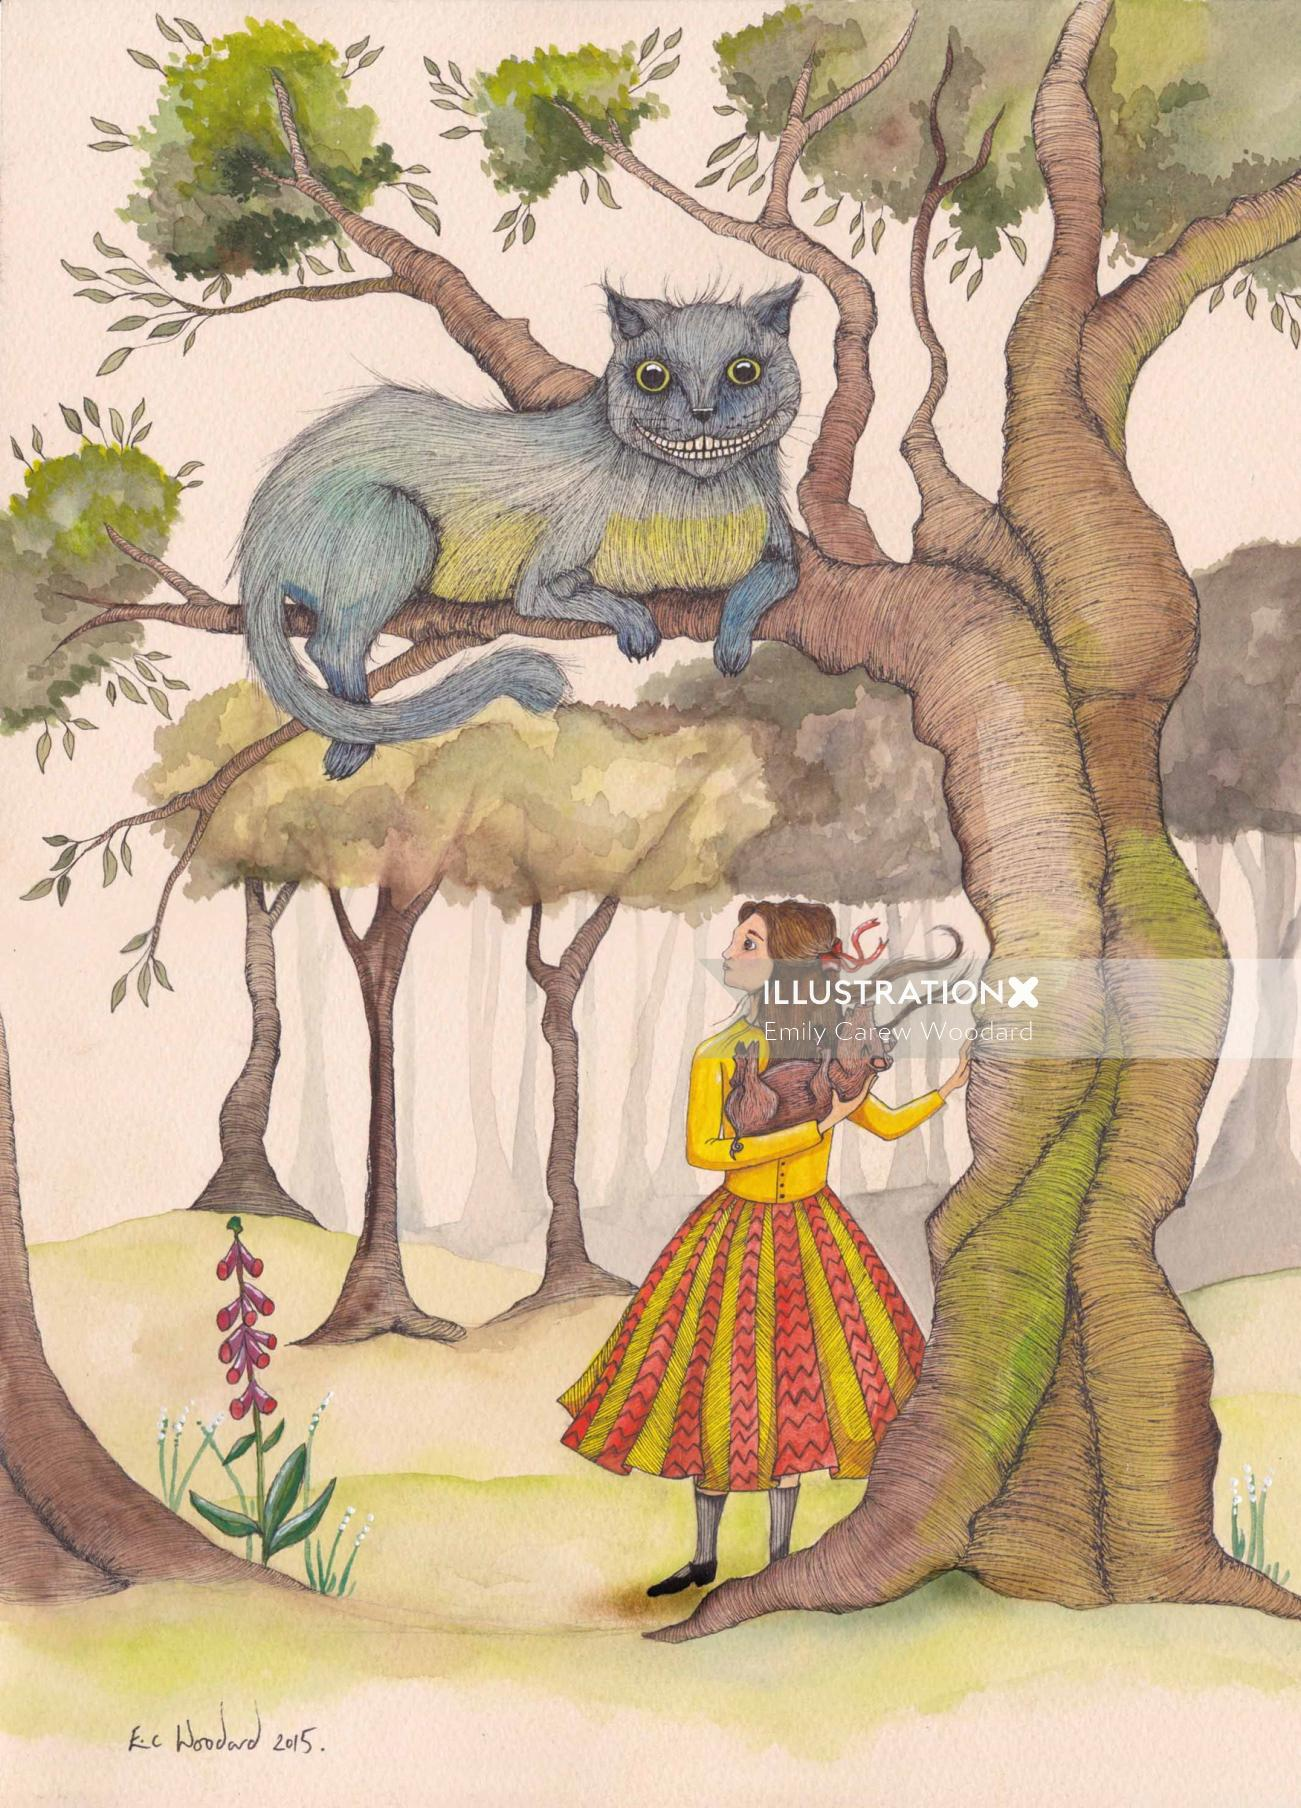 Girl under the tree illustration by Emily Carew Woodard